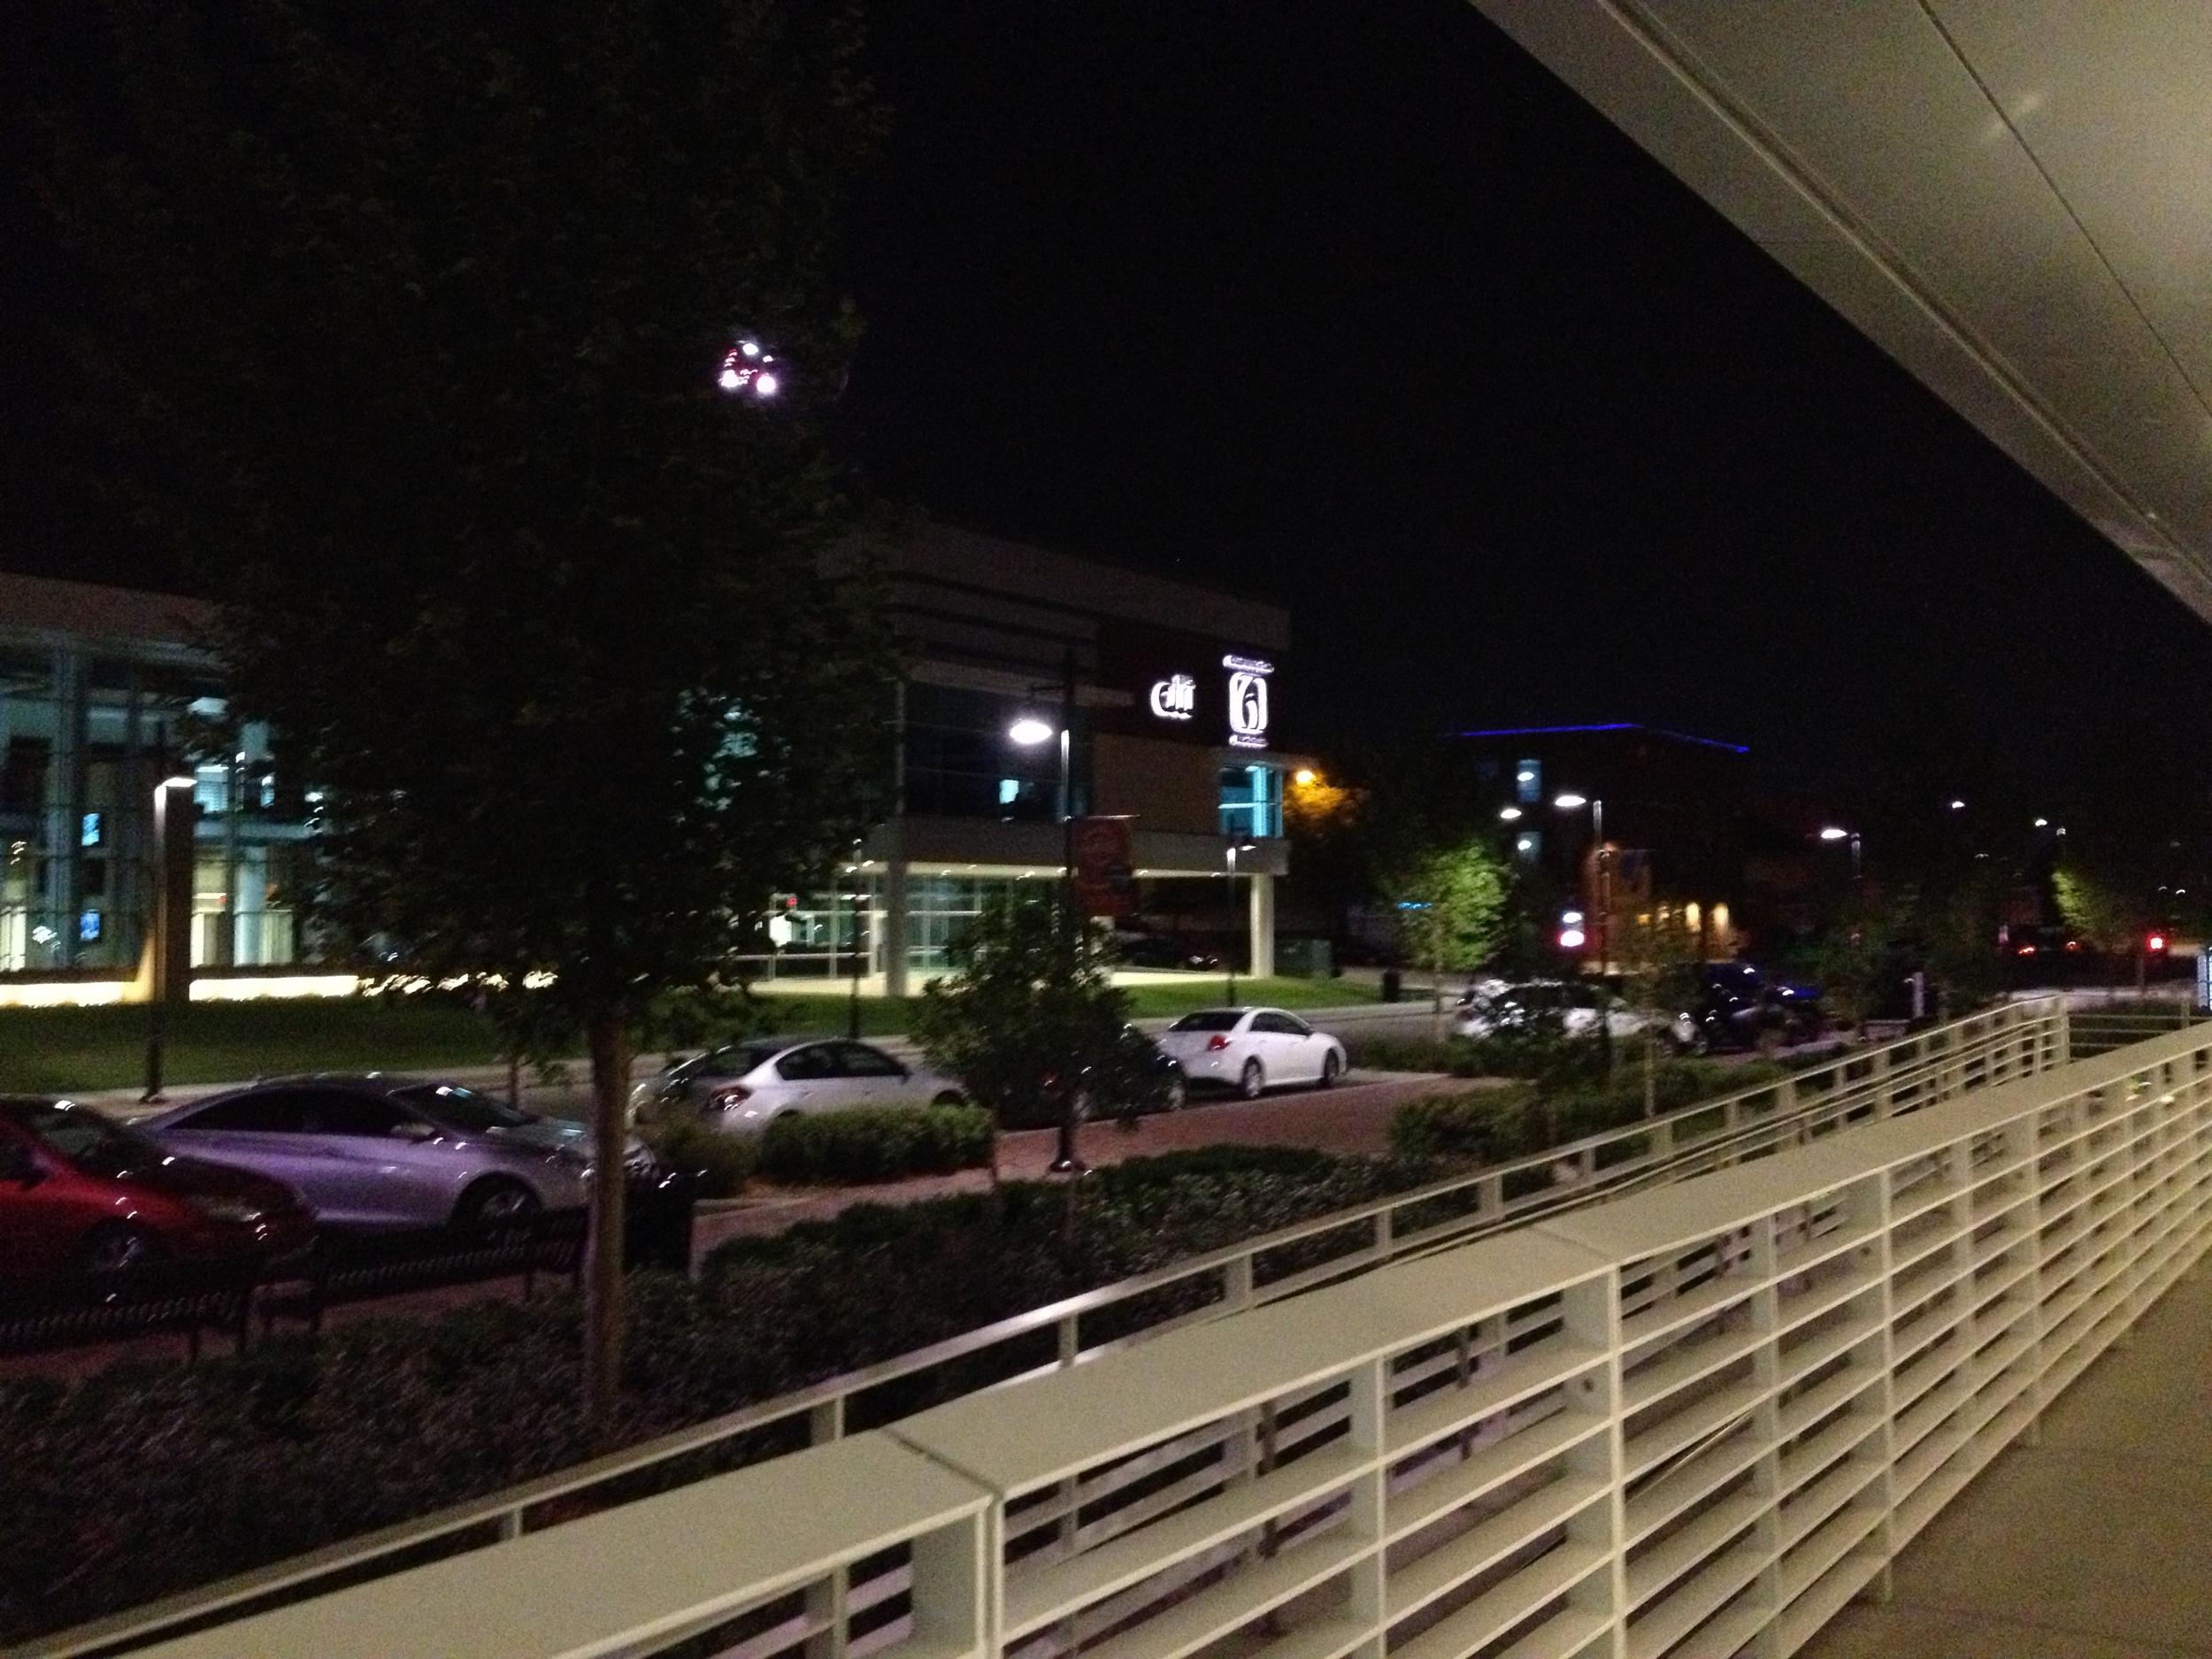 Channel SiX in Tulsa